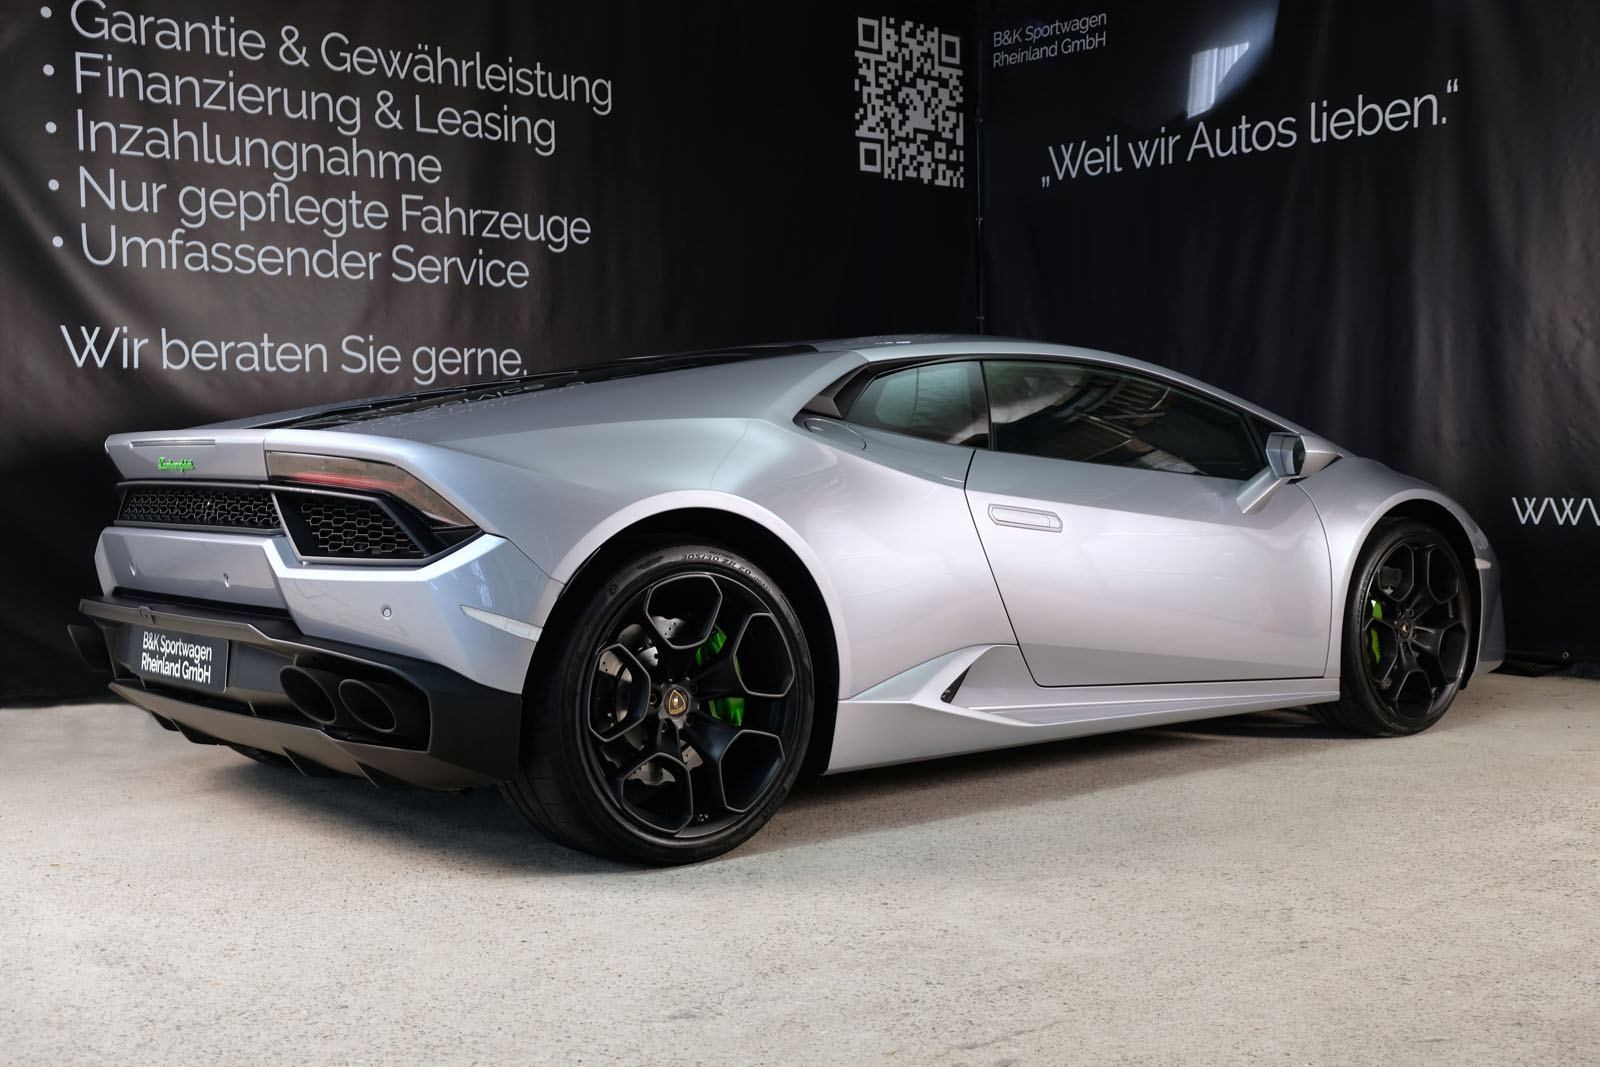 Lamborghini_Huracan_Silber_Schwarz-LAM-4265_2_w